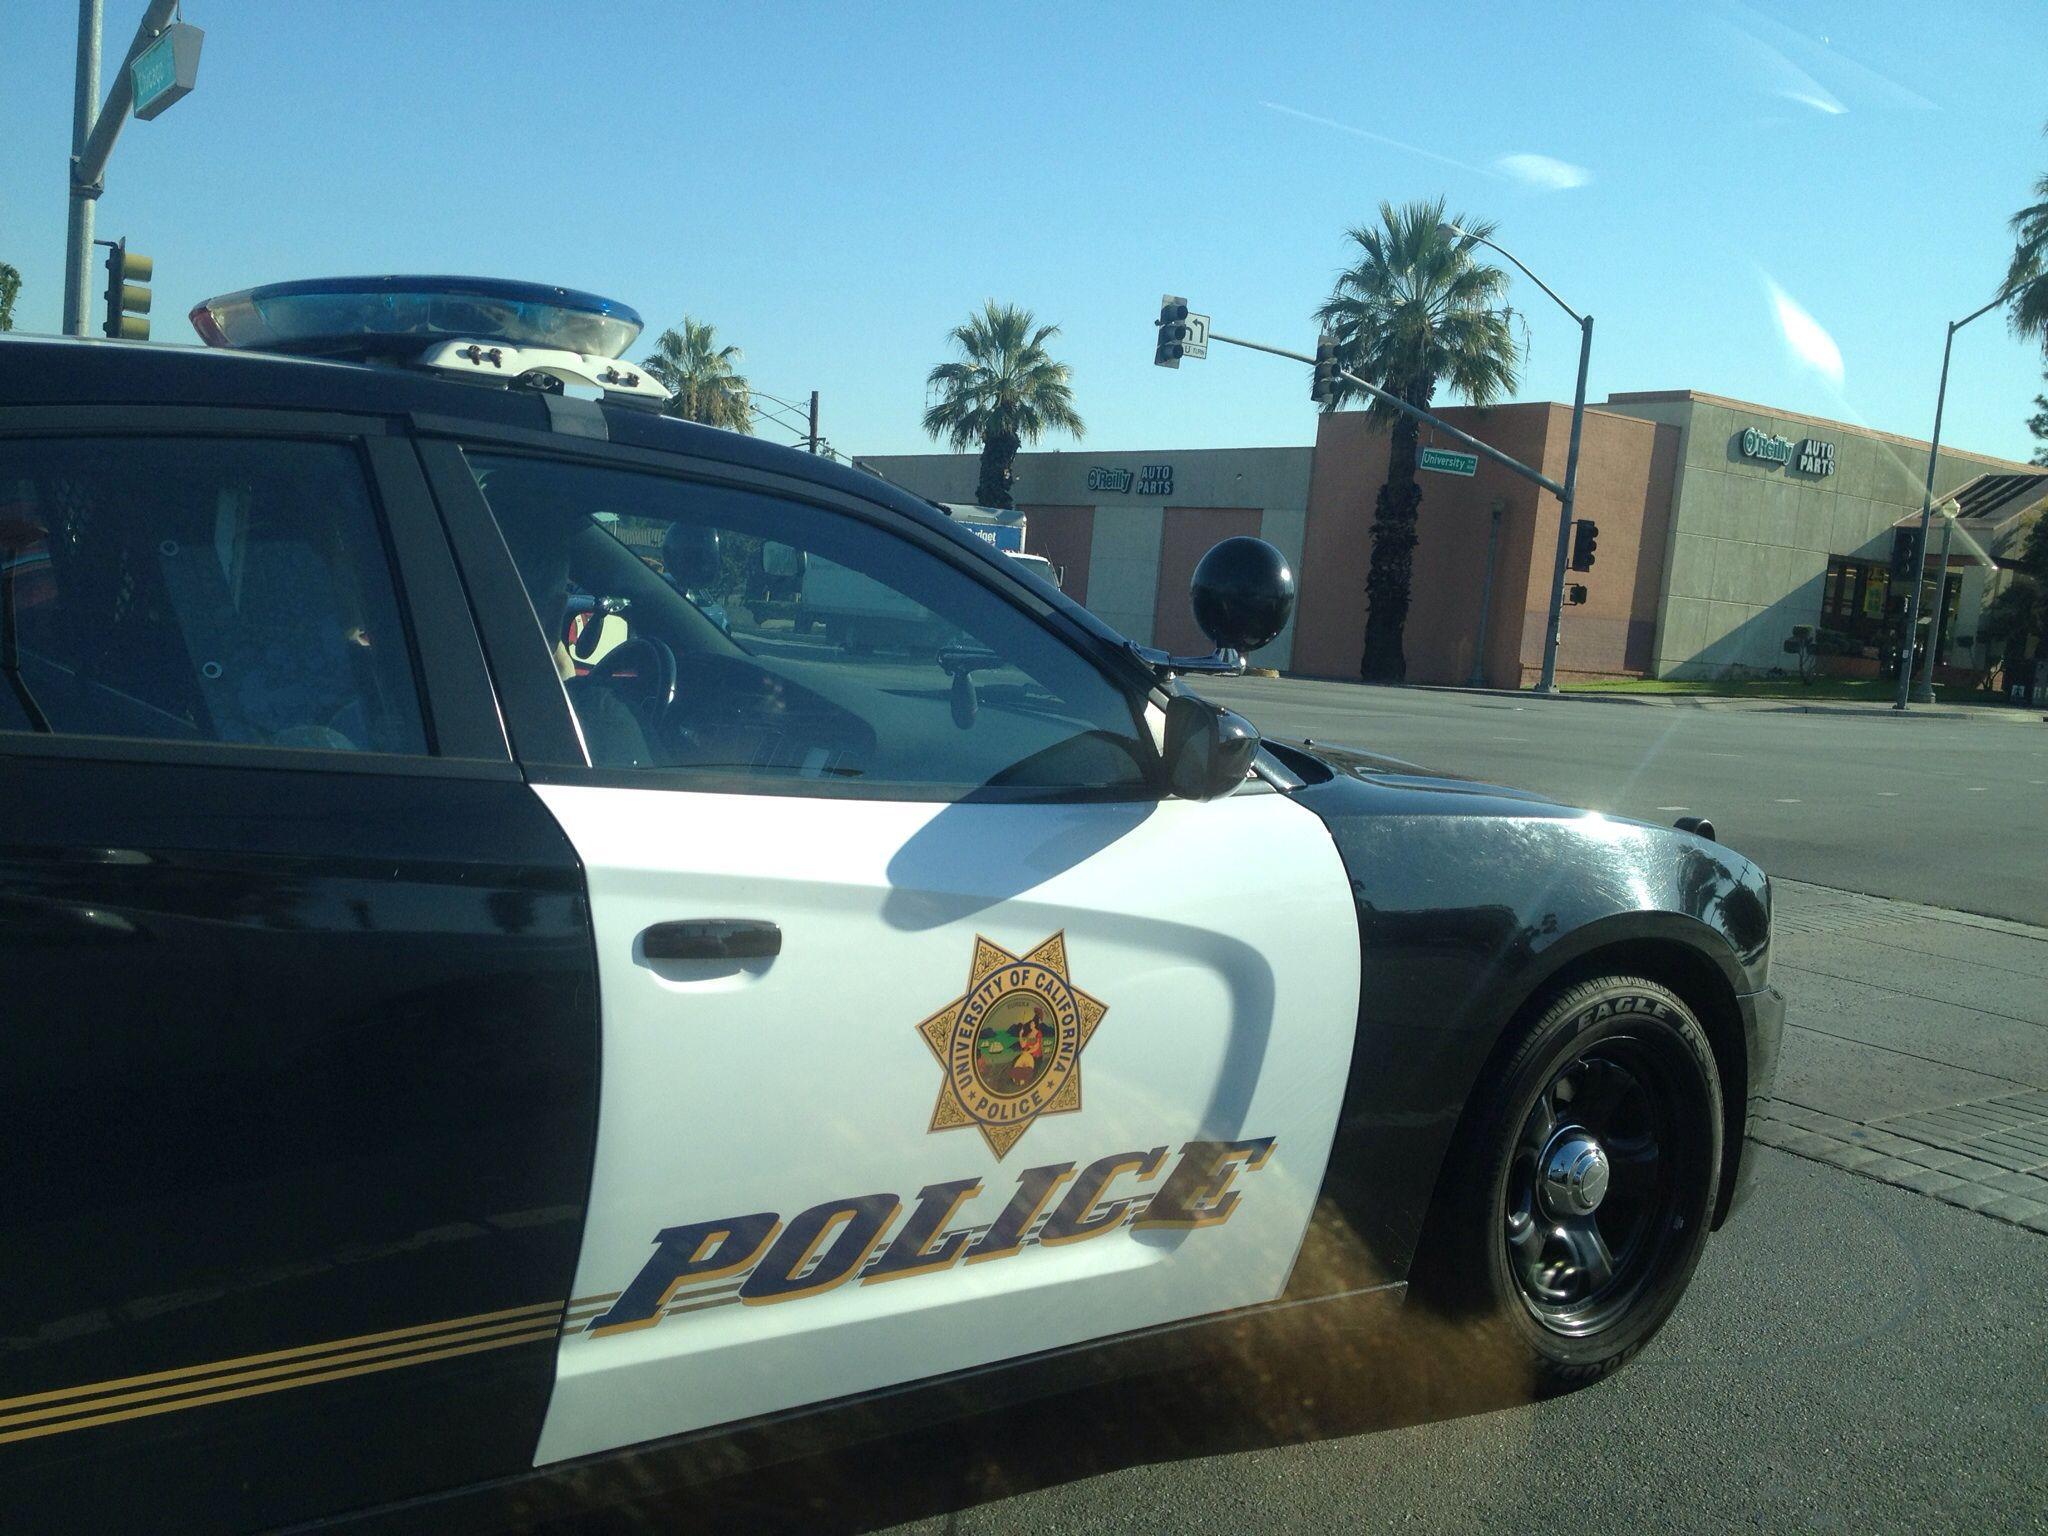 Uc Riverside Police Police Cars Car Photos Police